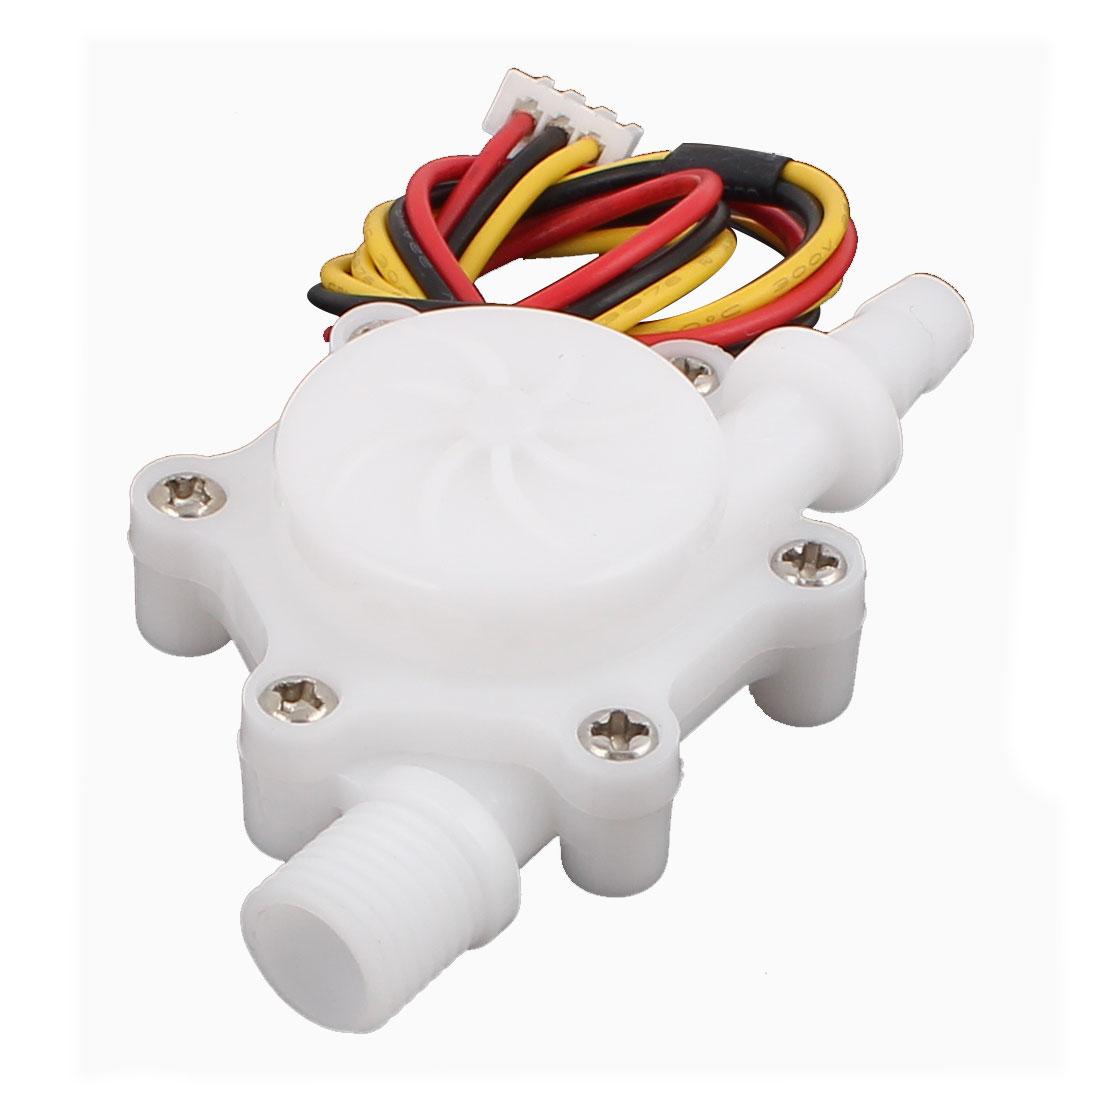 High Precision 0.3-4.0L/min G1/4 Thread 6mm OD Water Flow Sensor SEN-HZ06FB